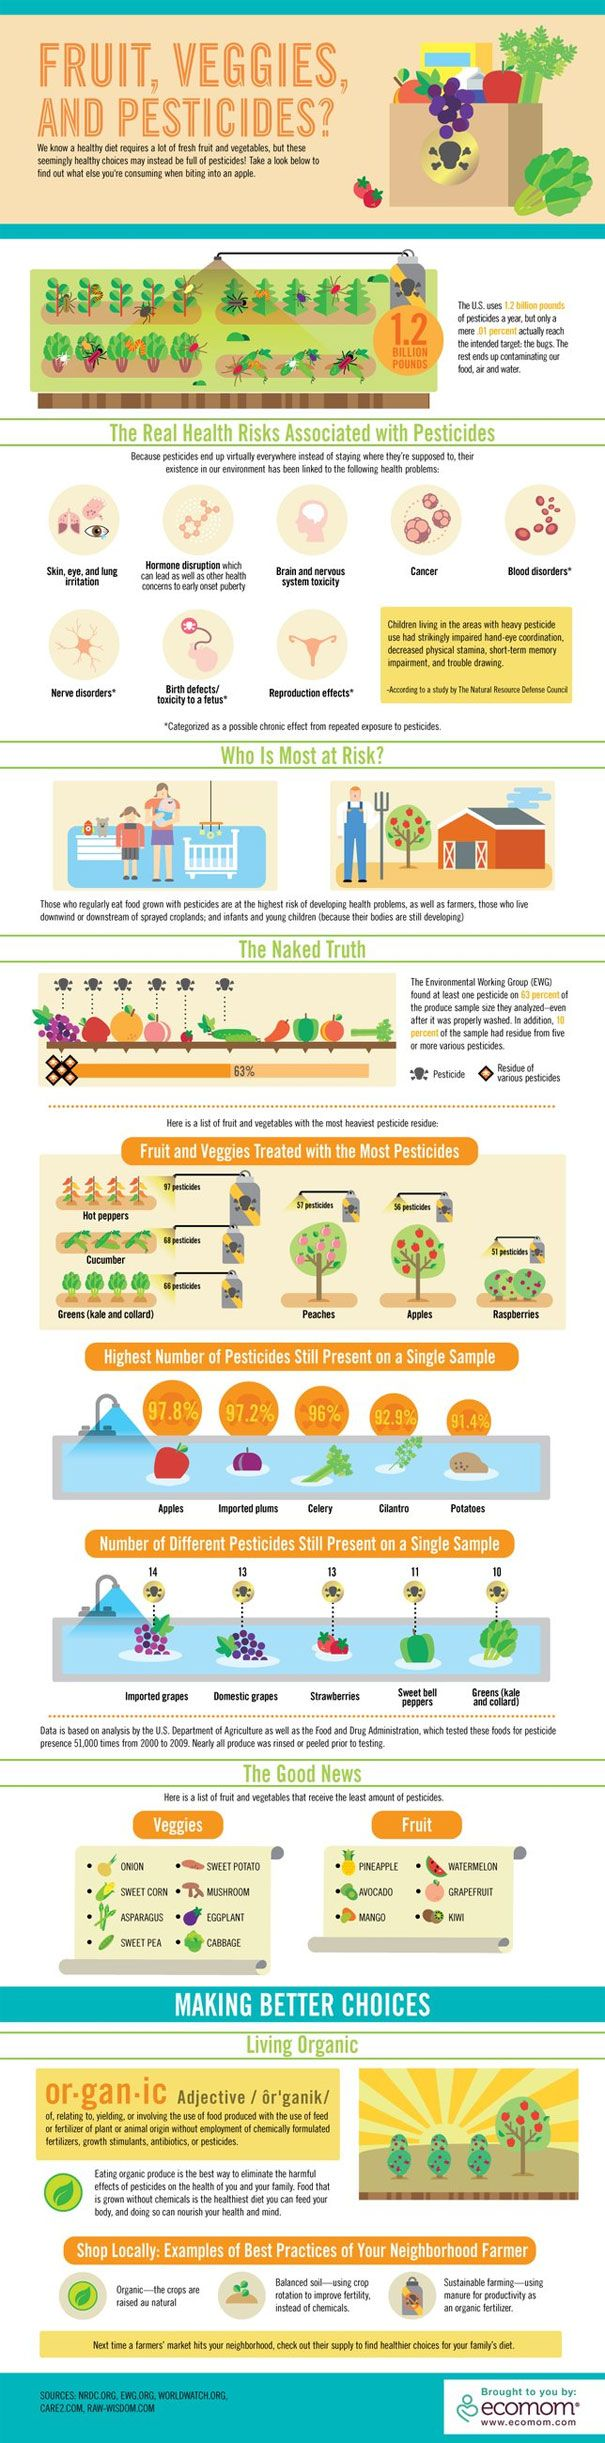 Pesticides to Organics, Make the Switch – Kale University calgary.isgreen.ca